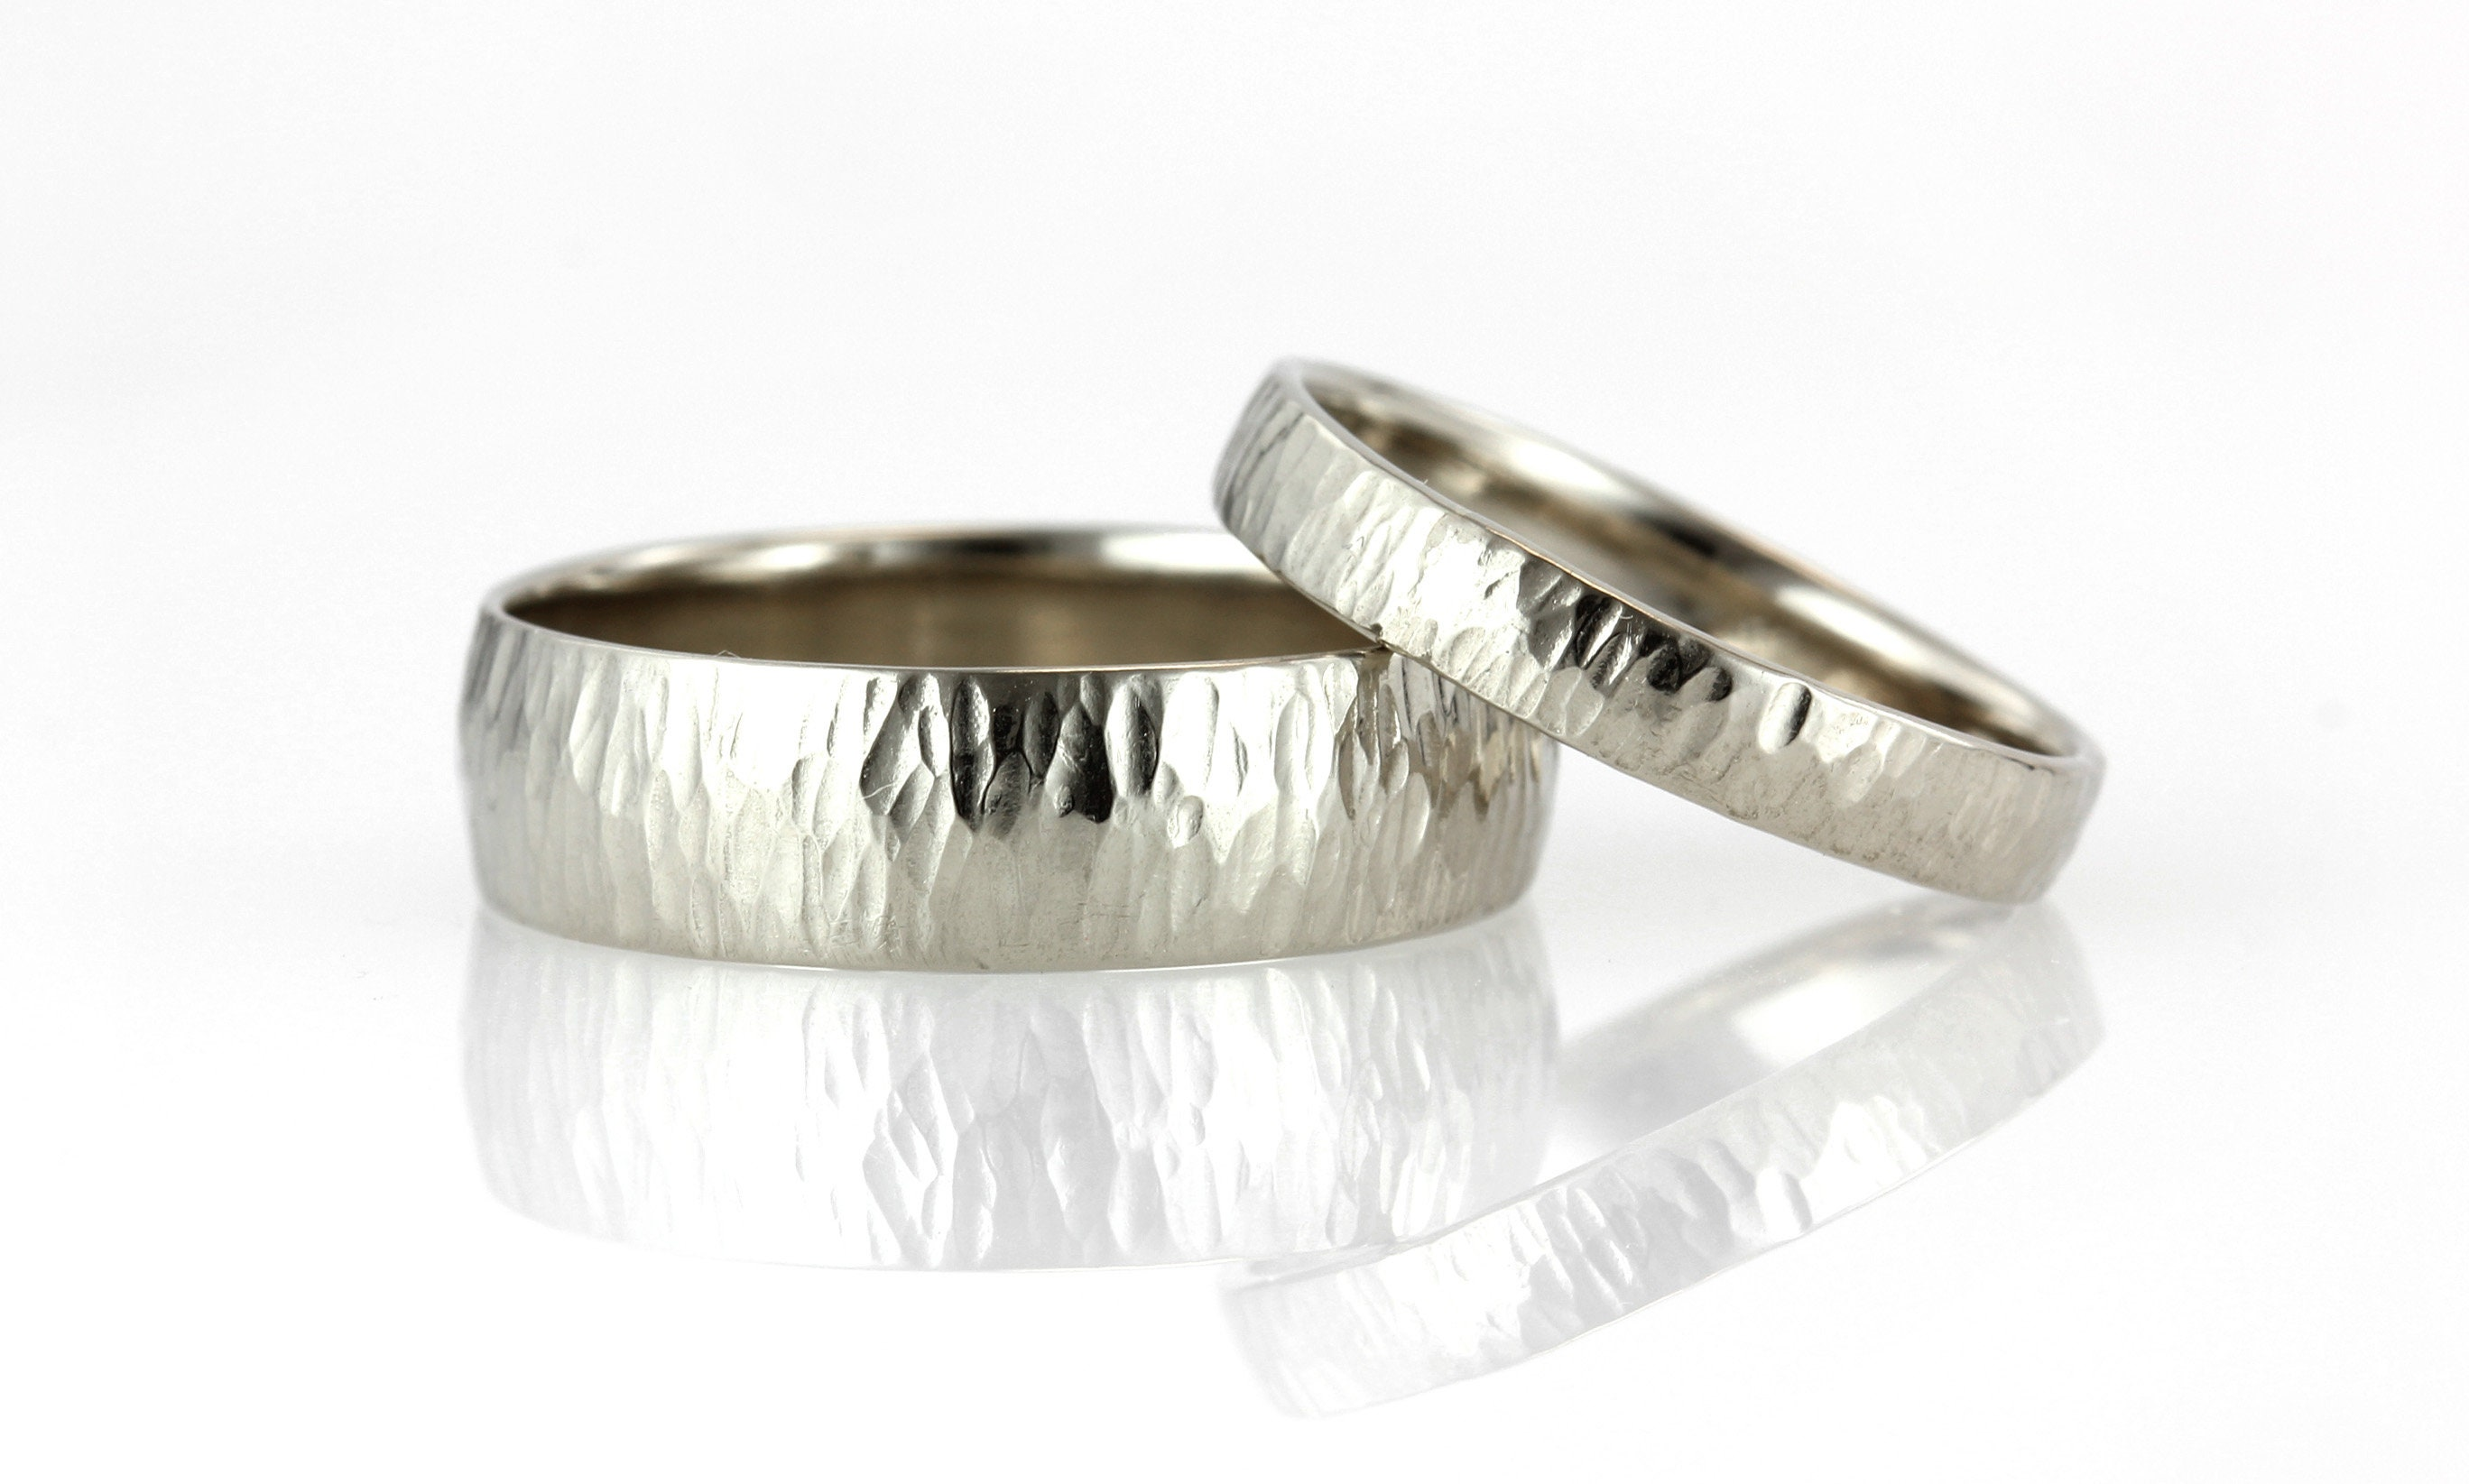 Light Half Round Wedding Band 3MM Mens 18K White Gold